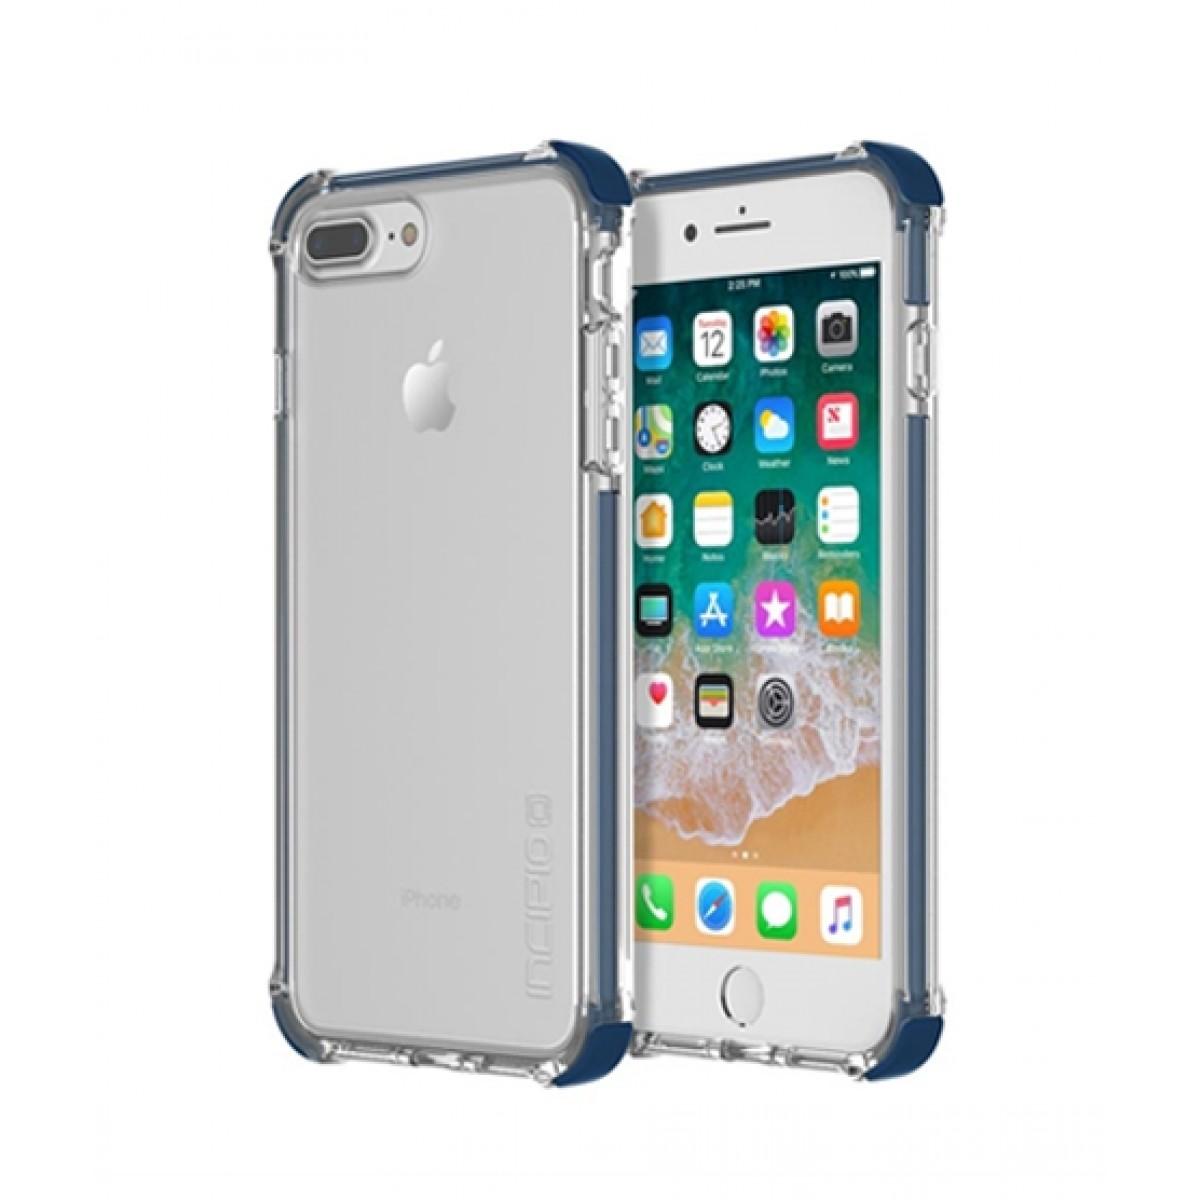 official photos 71713 1fe88 Incipio Reprieve Sport Blue/Clear Case For iPhone 8 Plus